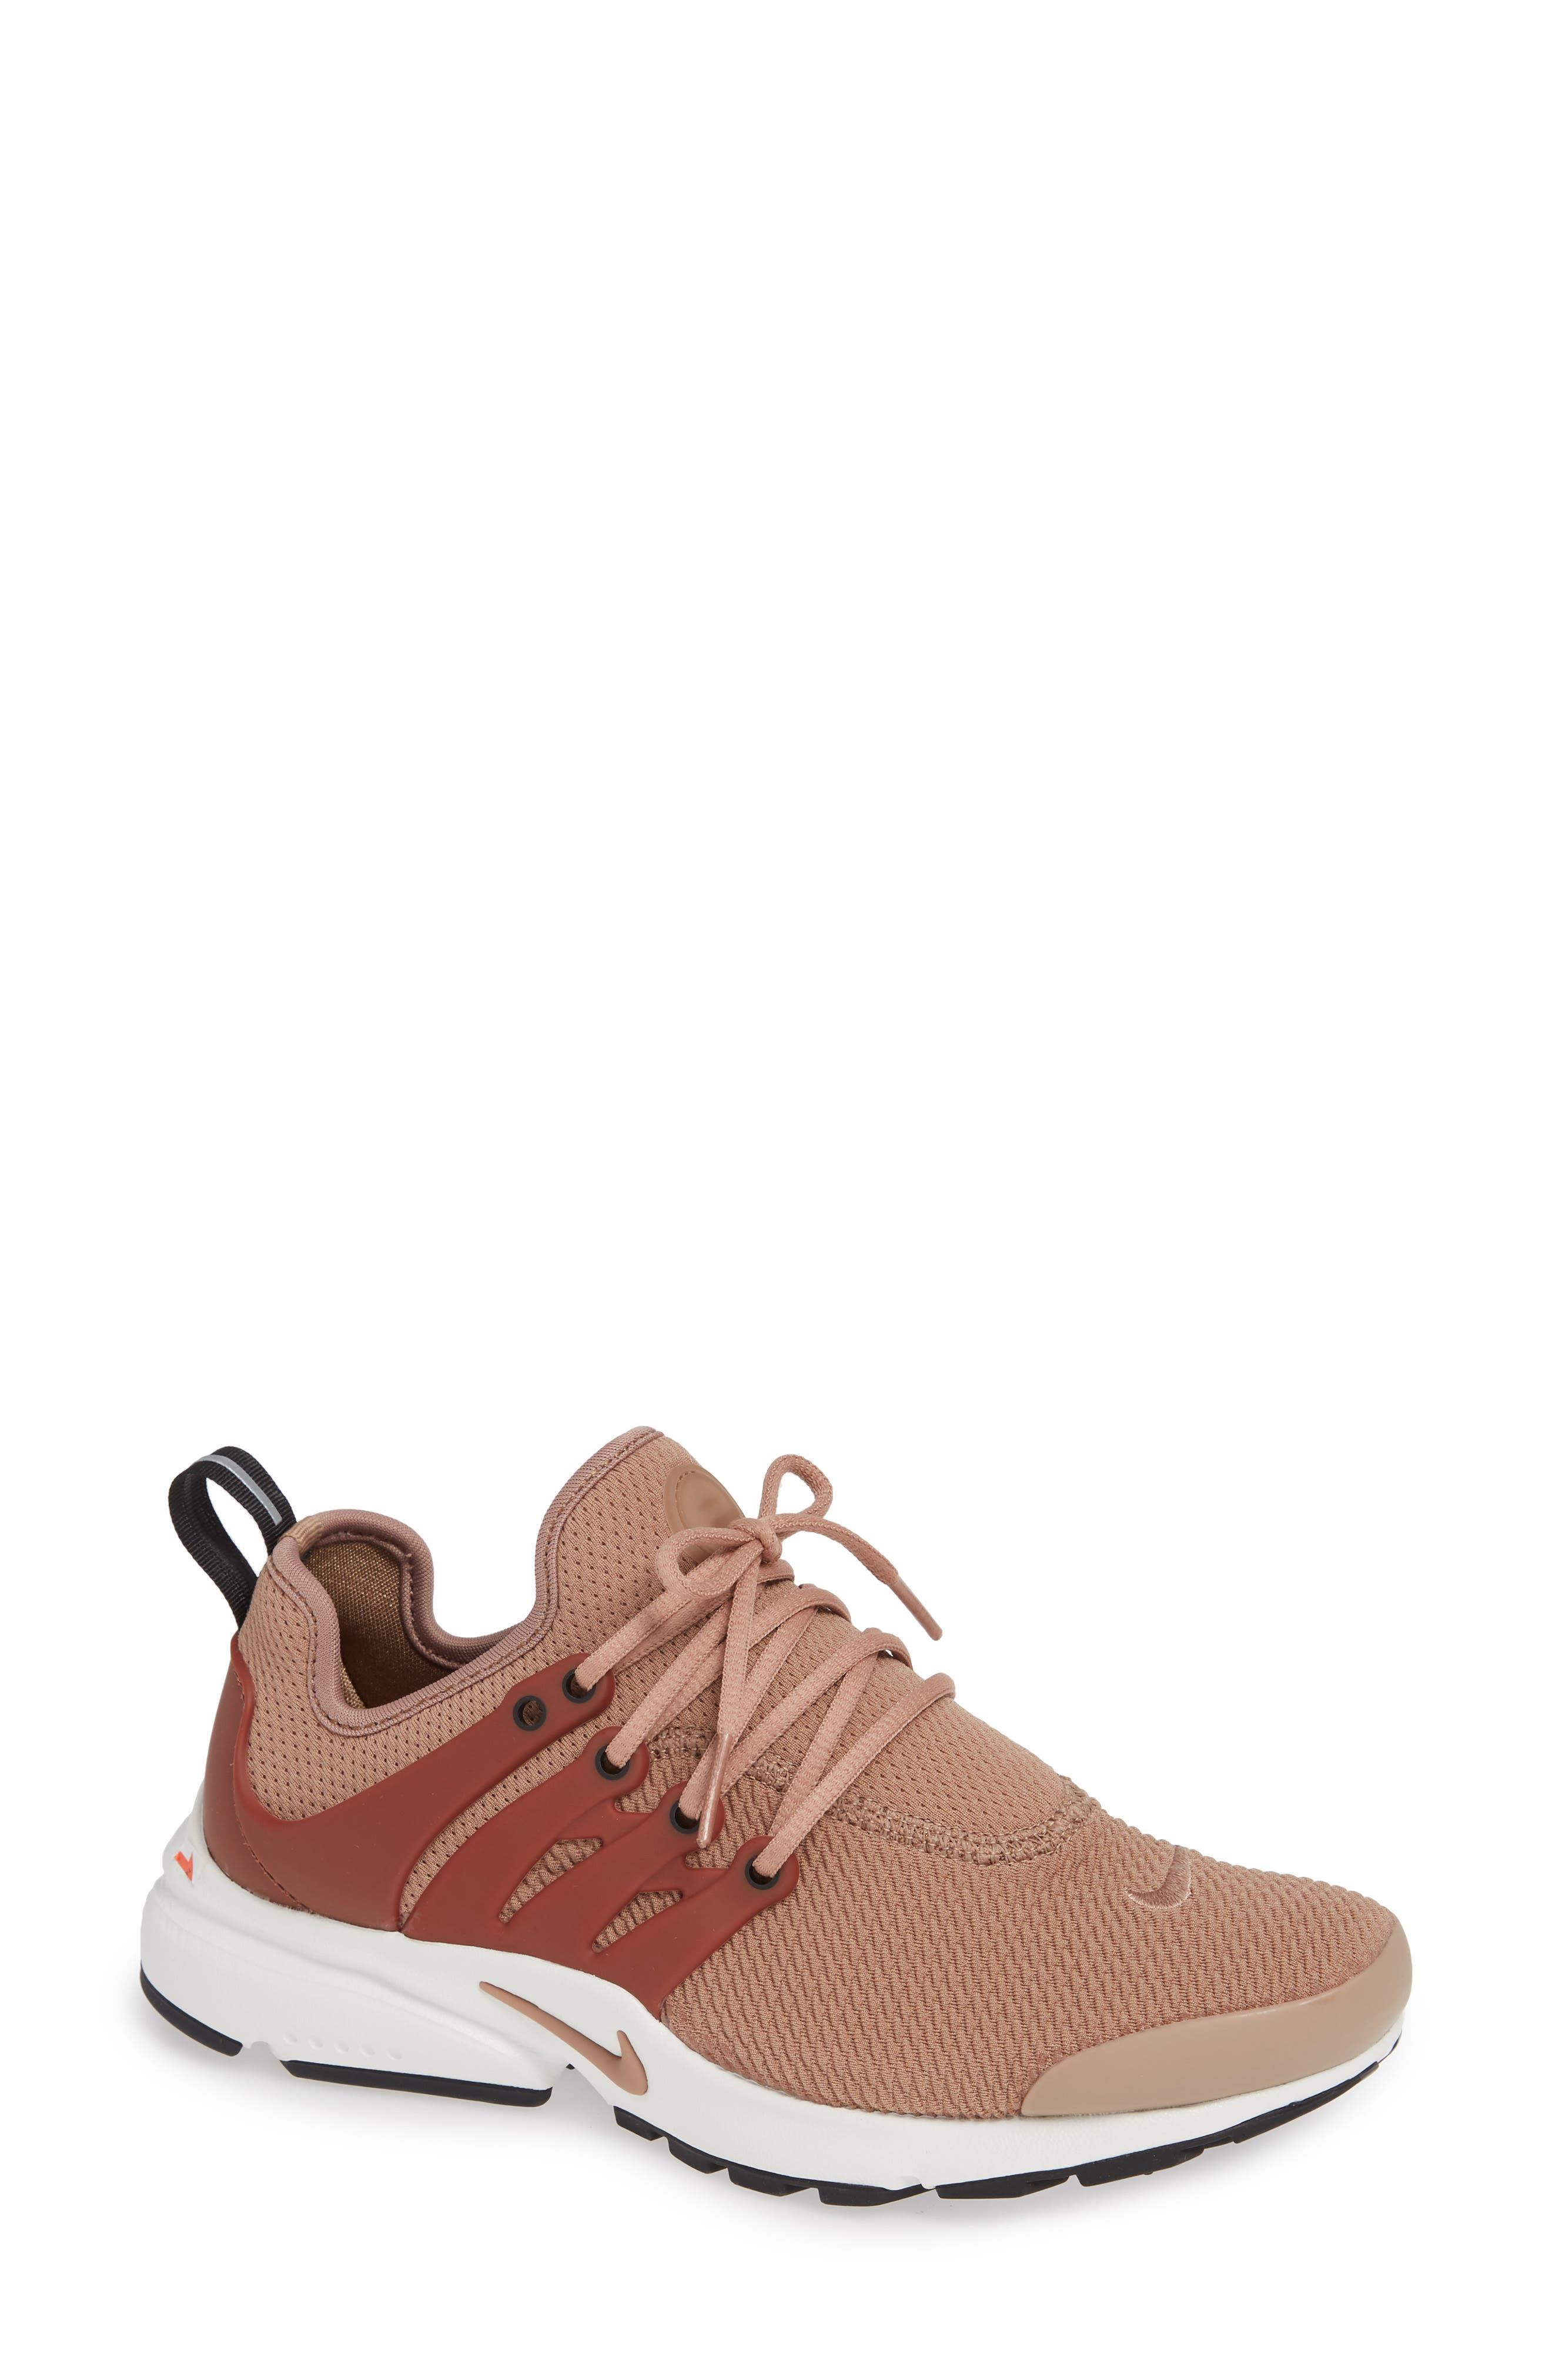 Air Presto Sneaker,                             Main thumbnail 1, color,                             251